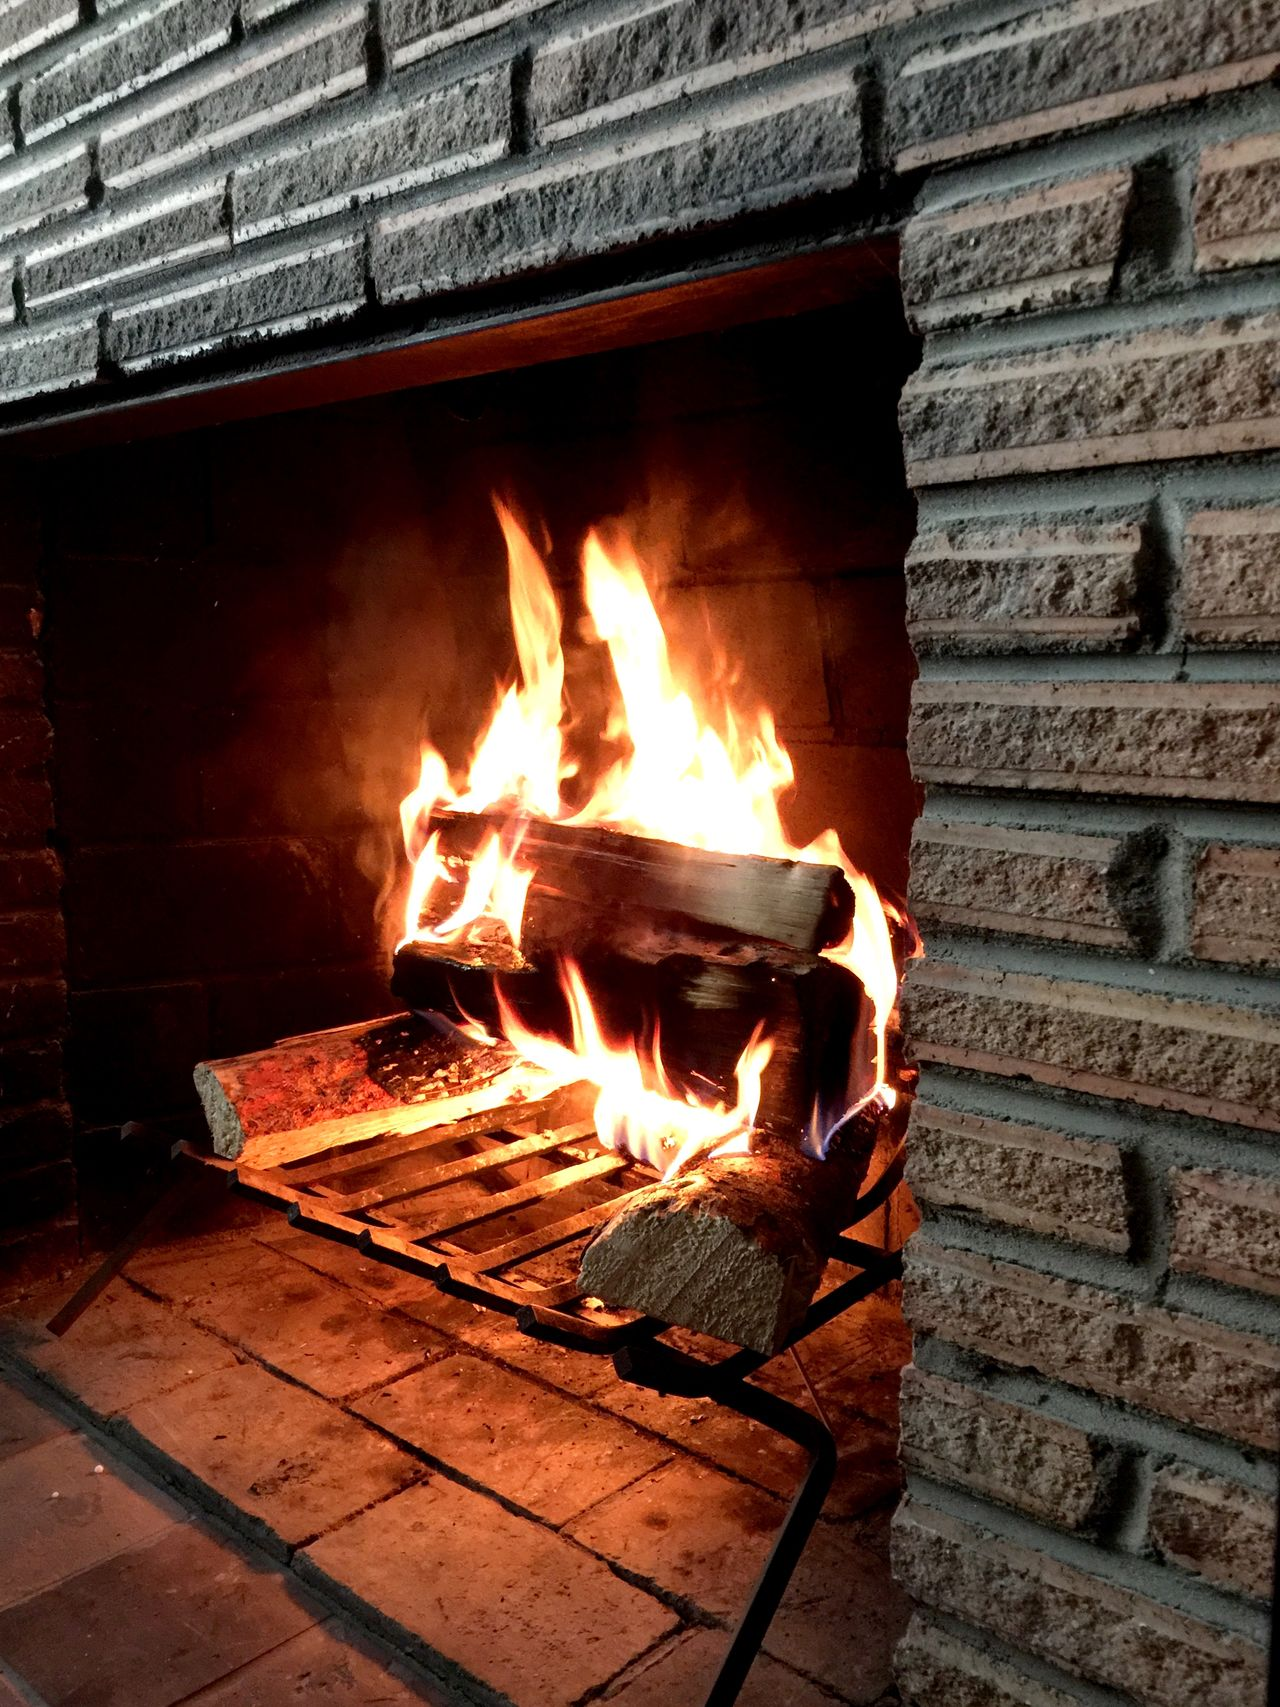 Fire Fireplace Home Brick Wood Element Warm